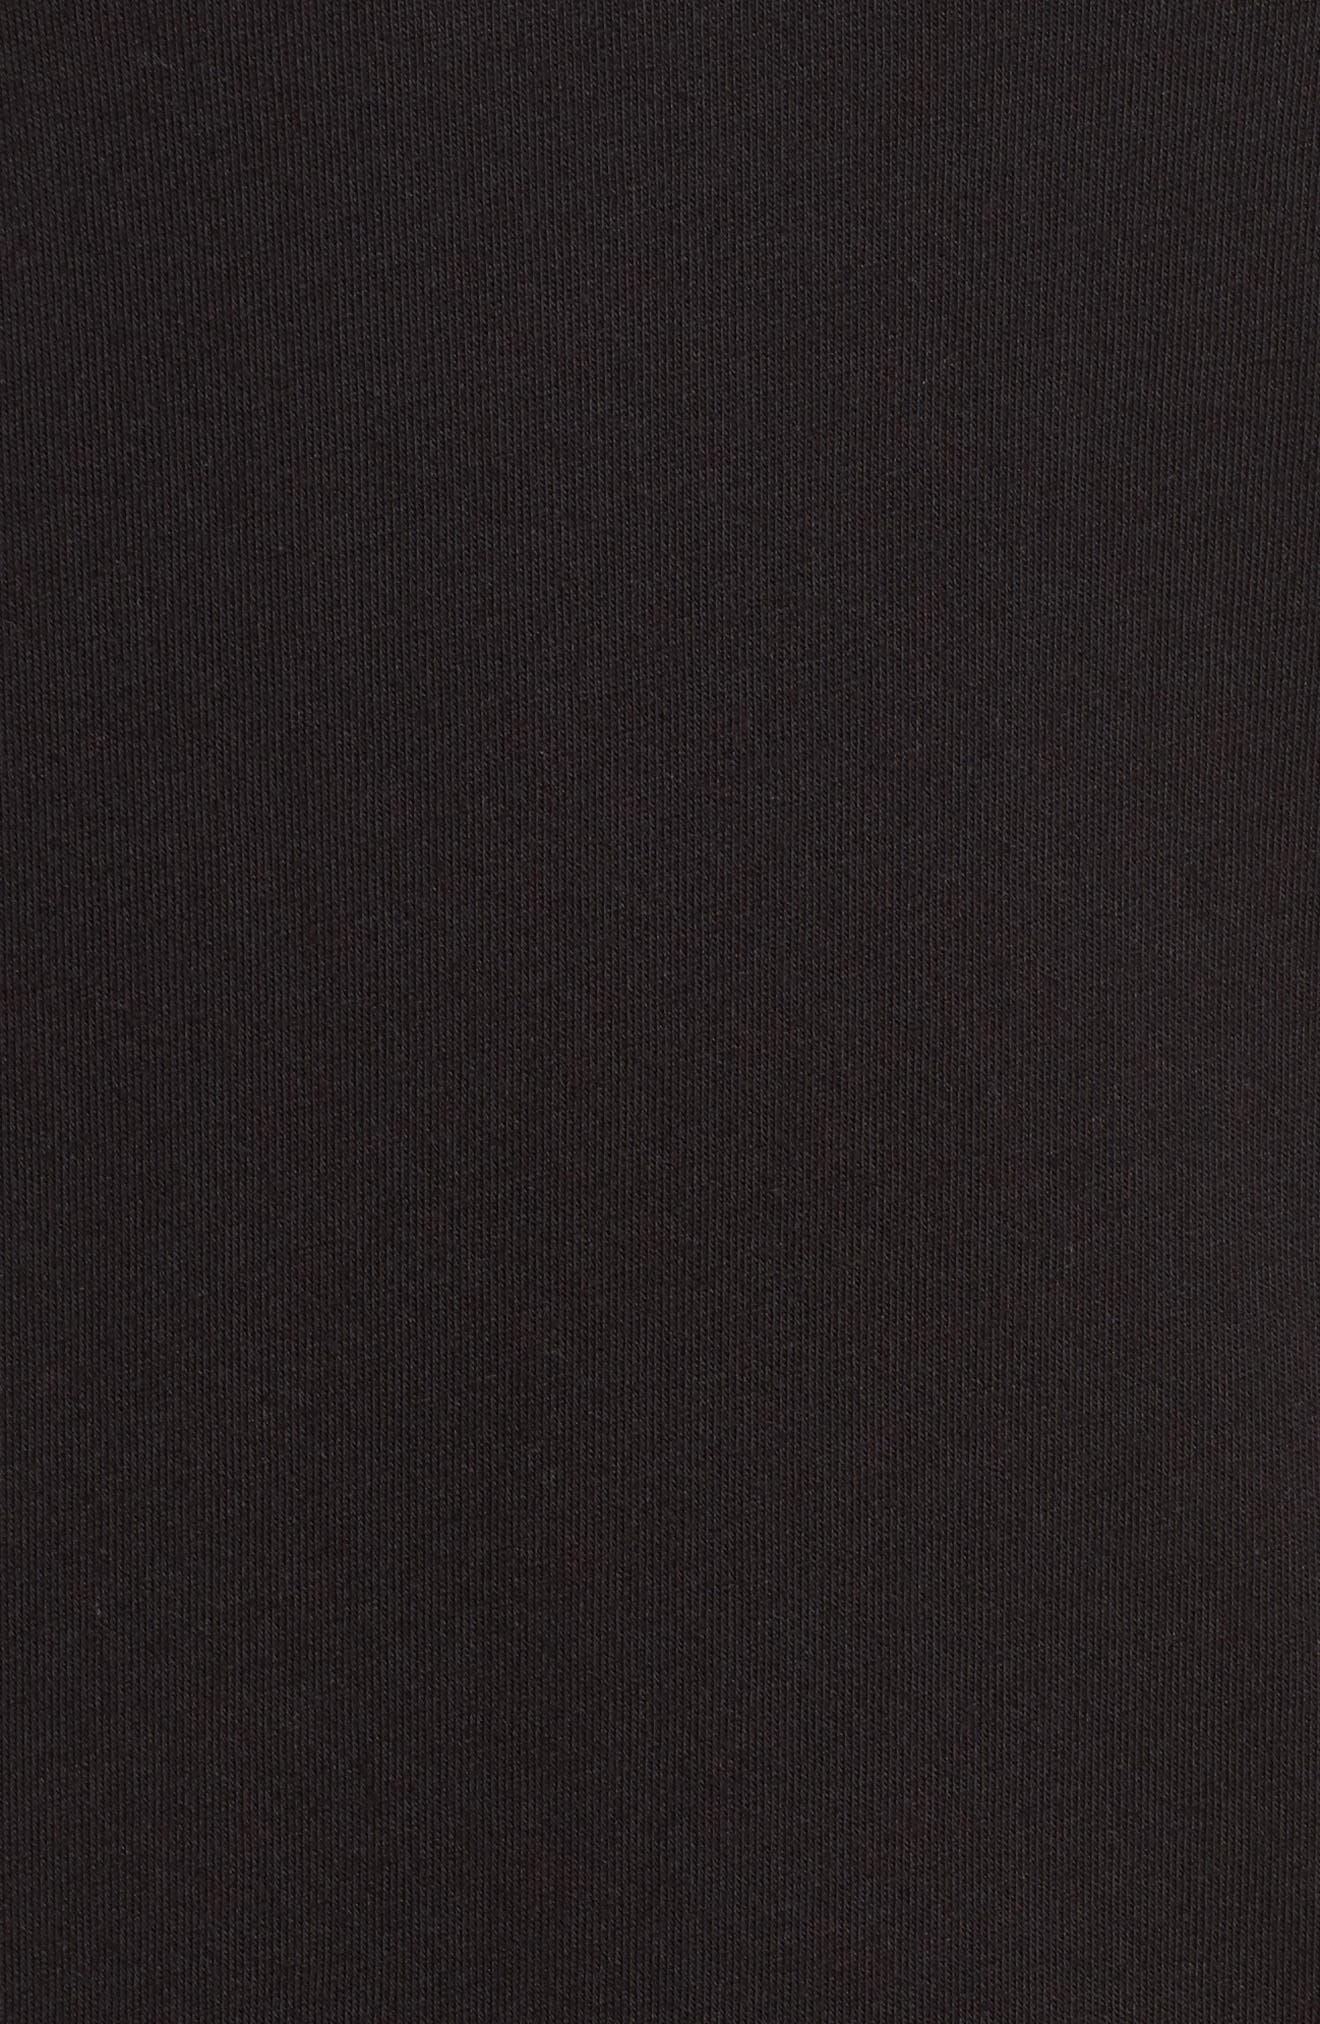 Poplin Sleeve Knit Dress,                             Alternate thumbnail 5, color,                             Black